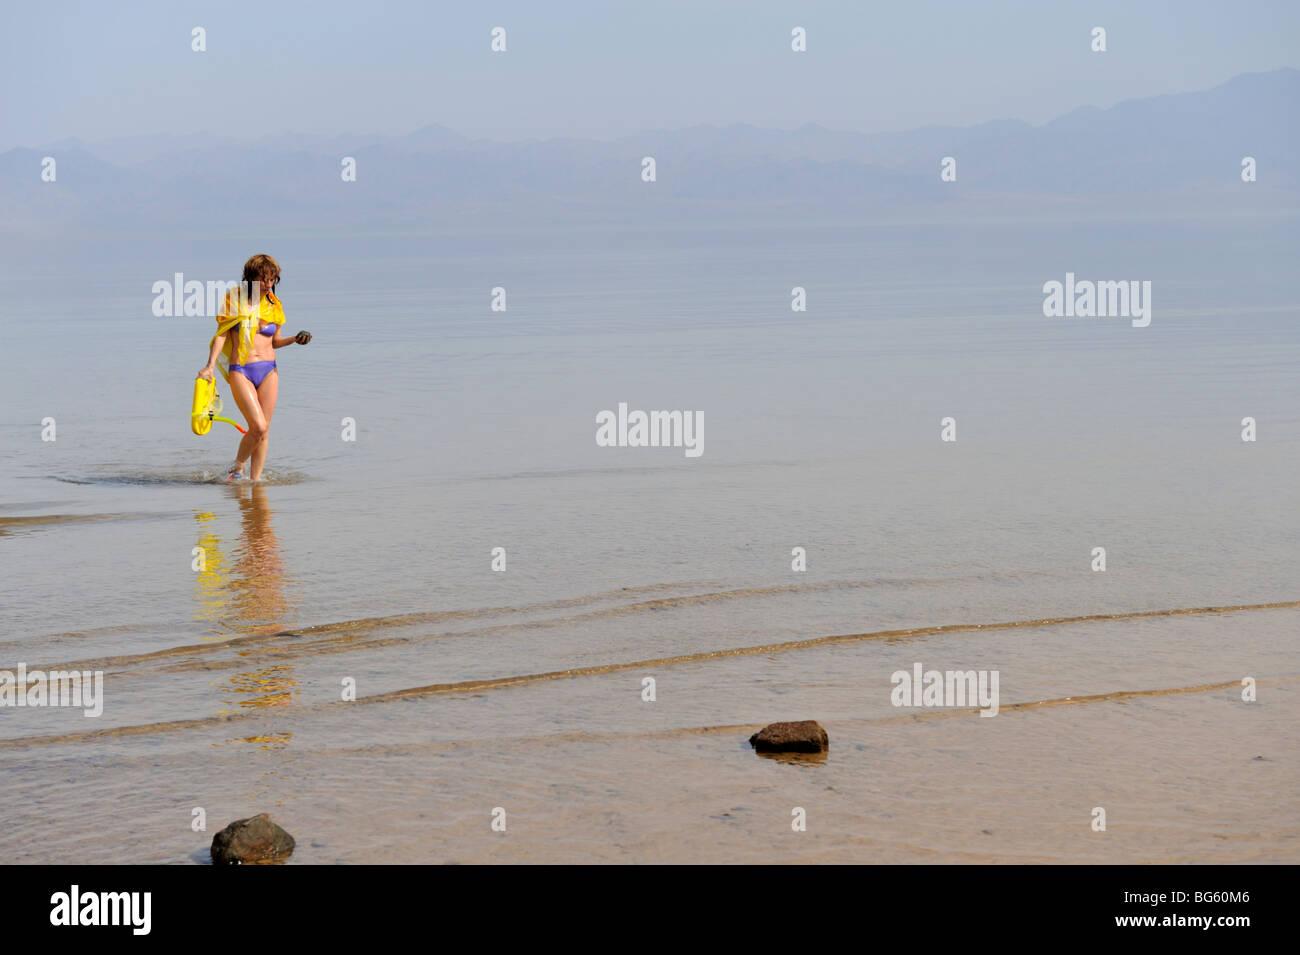 Mujer en bikini saliendo del mar con atmósfera brumosa Imagen De Stock